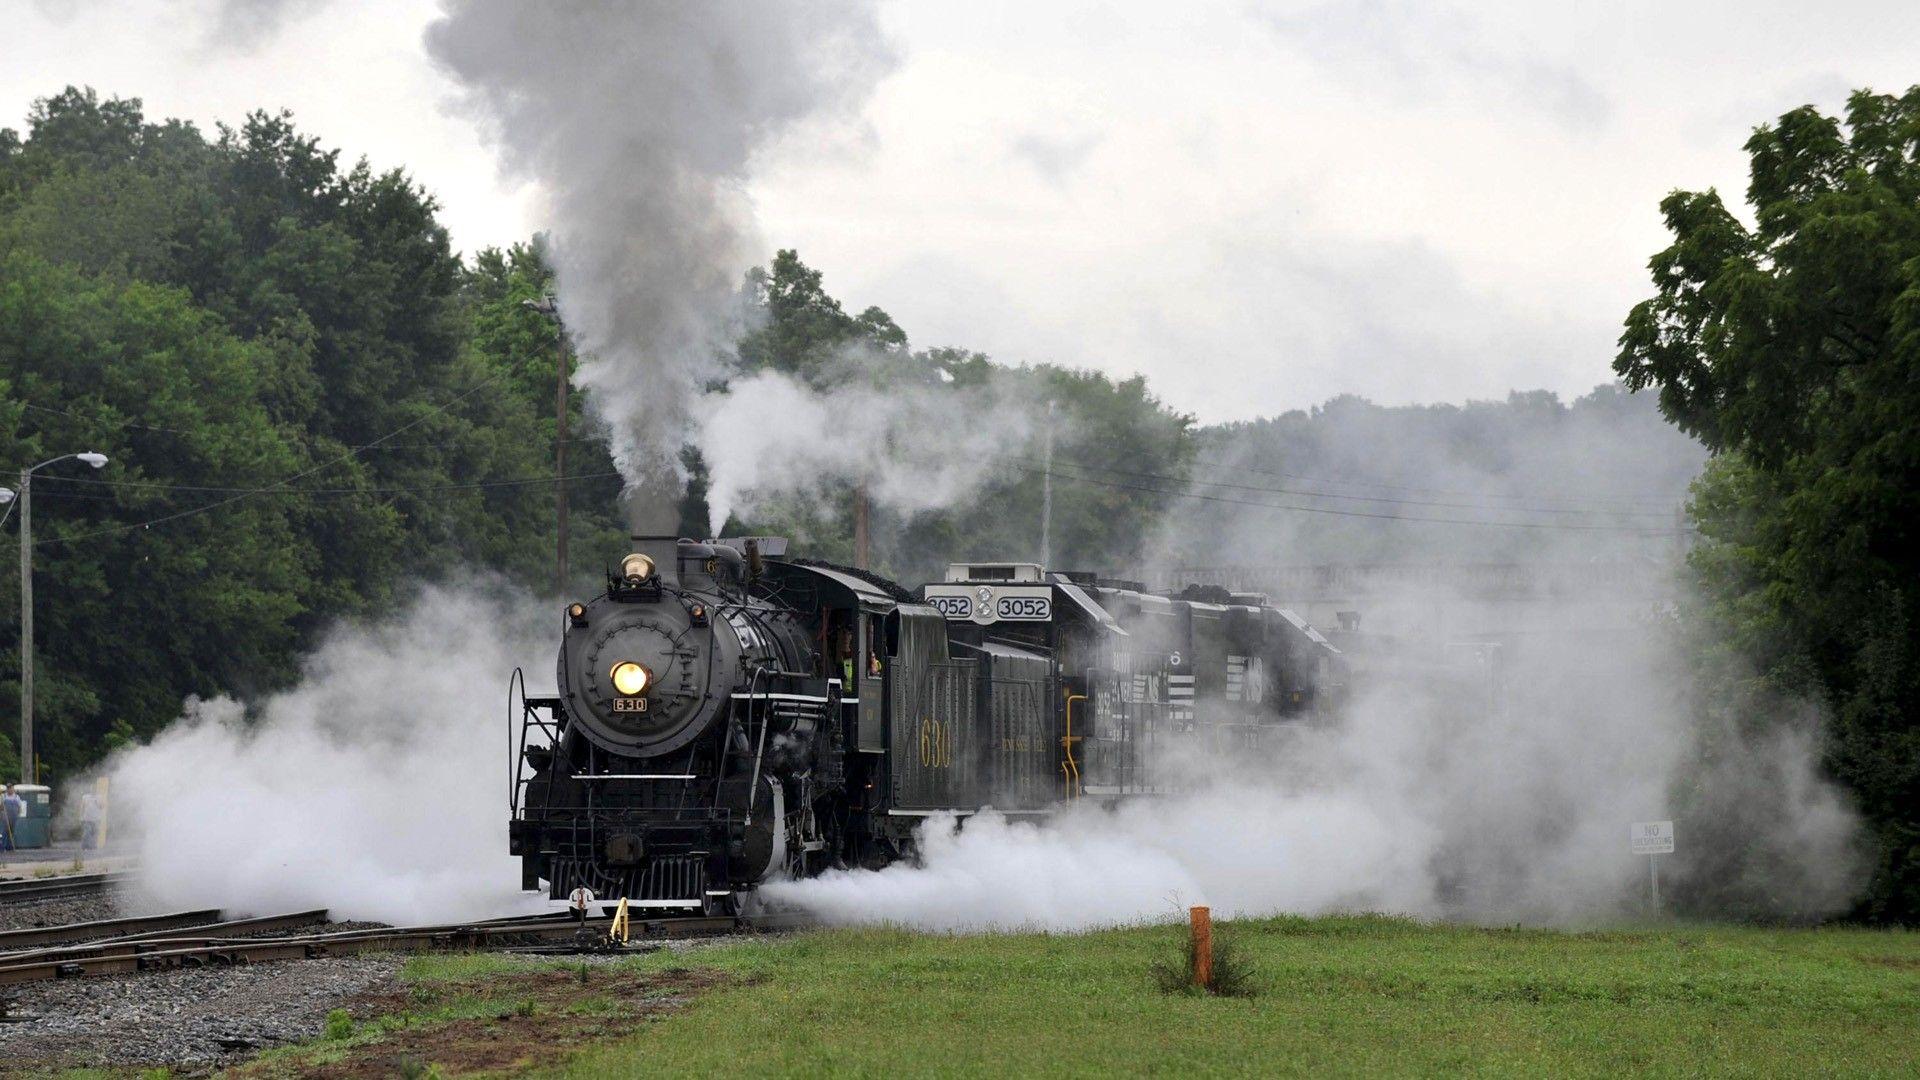 Image detail for -Trains Steam Train Locomotives Widescreen Fresh HD Wallpaper Free ... | Trains ...